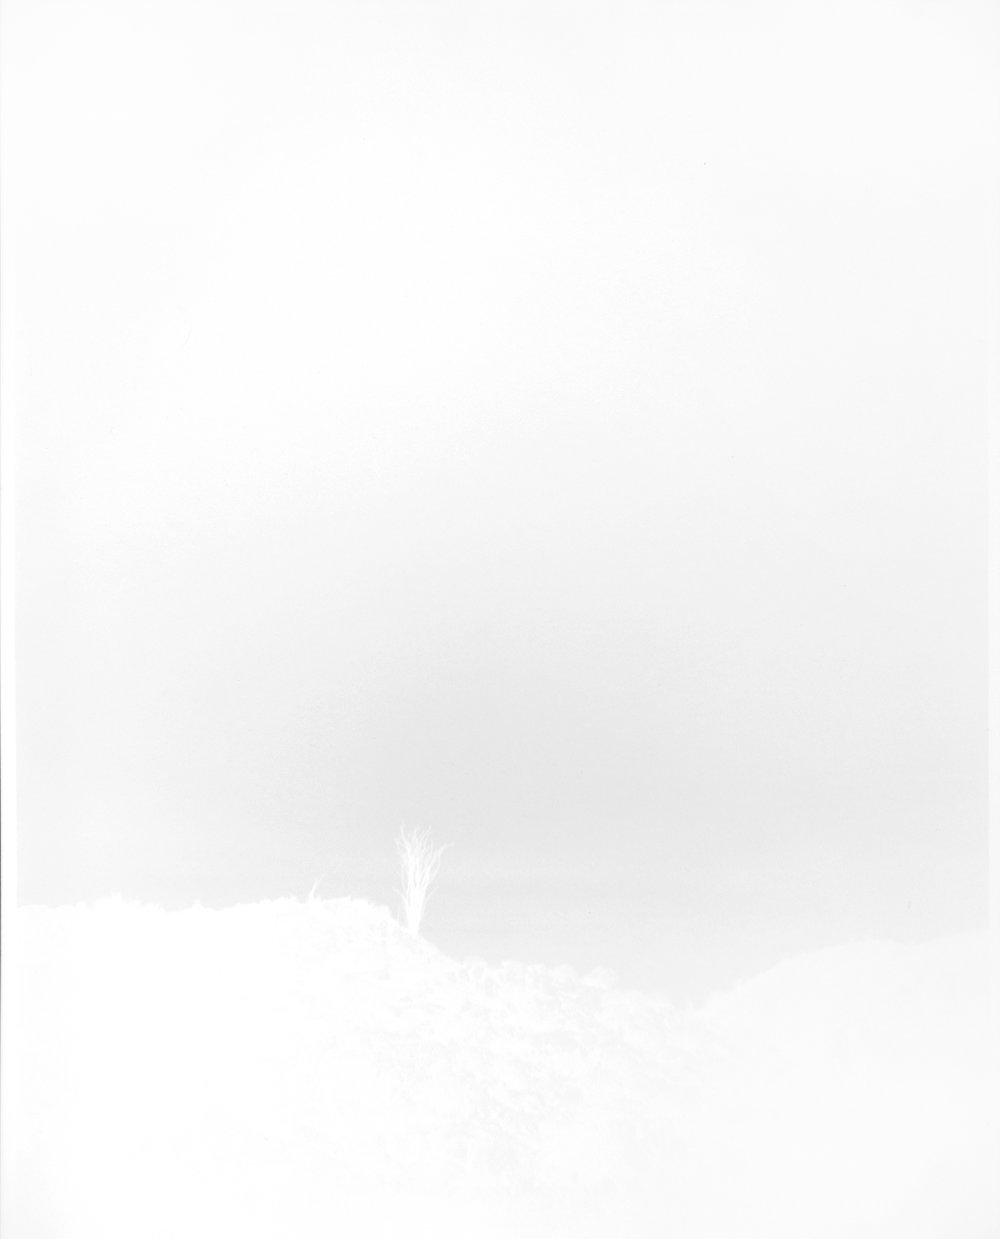 scott b. davis  ocotillo, ocotillo (no. 4), 2015 unique paper negative palladium print 20 x 16 inches